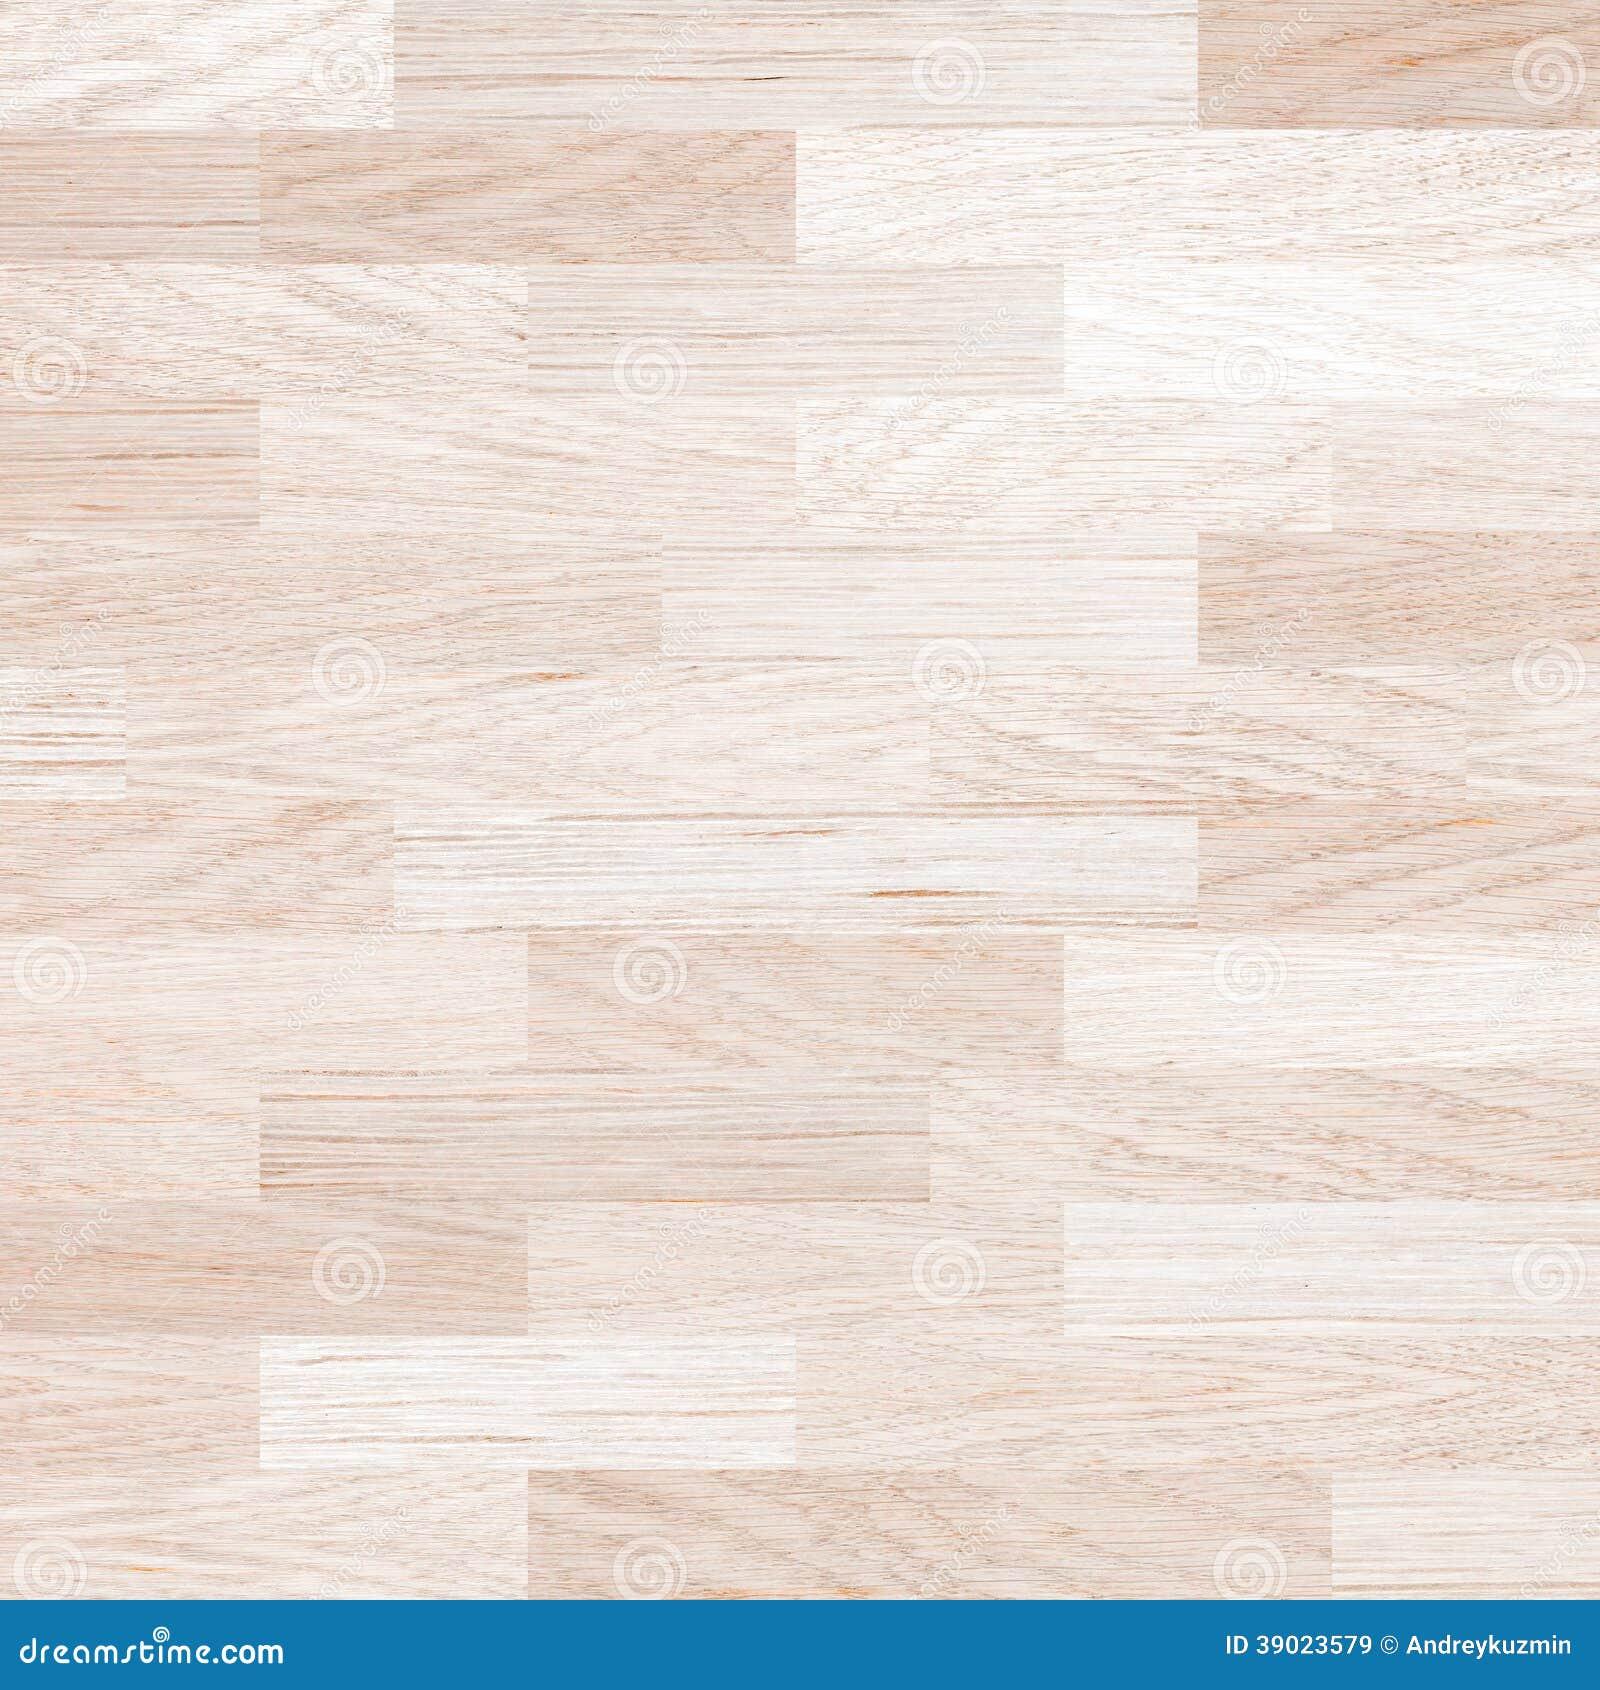 wooden floor parquet background stock photo image 39023579. Black Bedroom Furniture Sets. Home Design Ideas